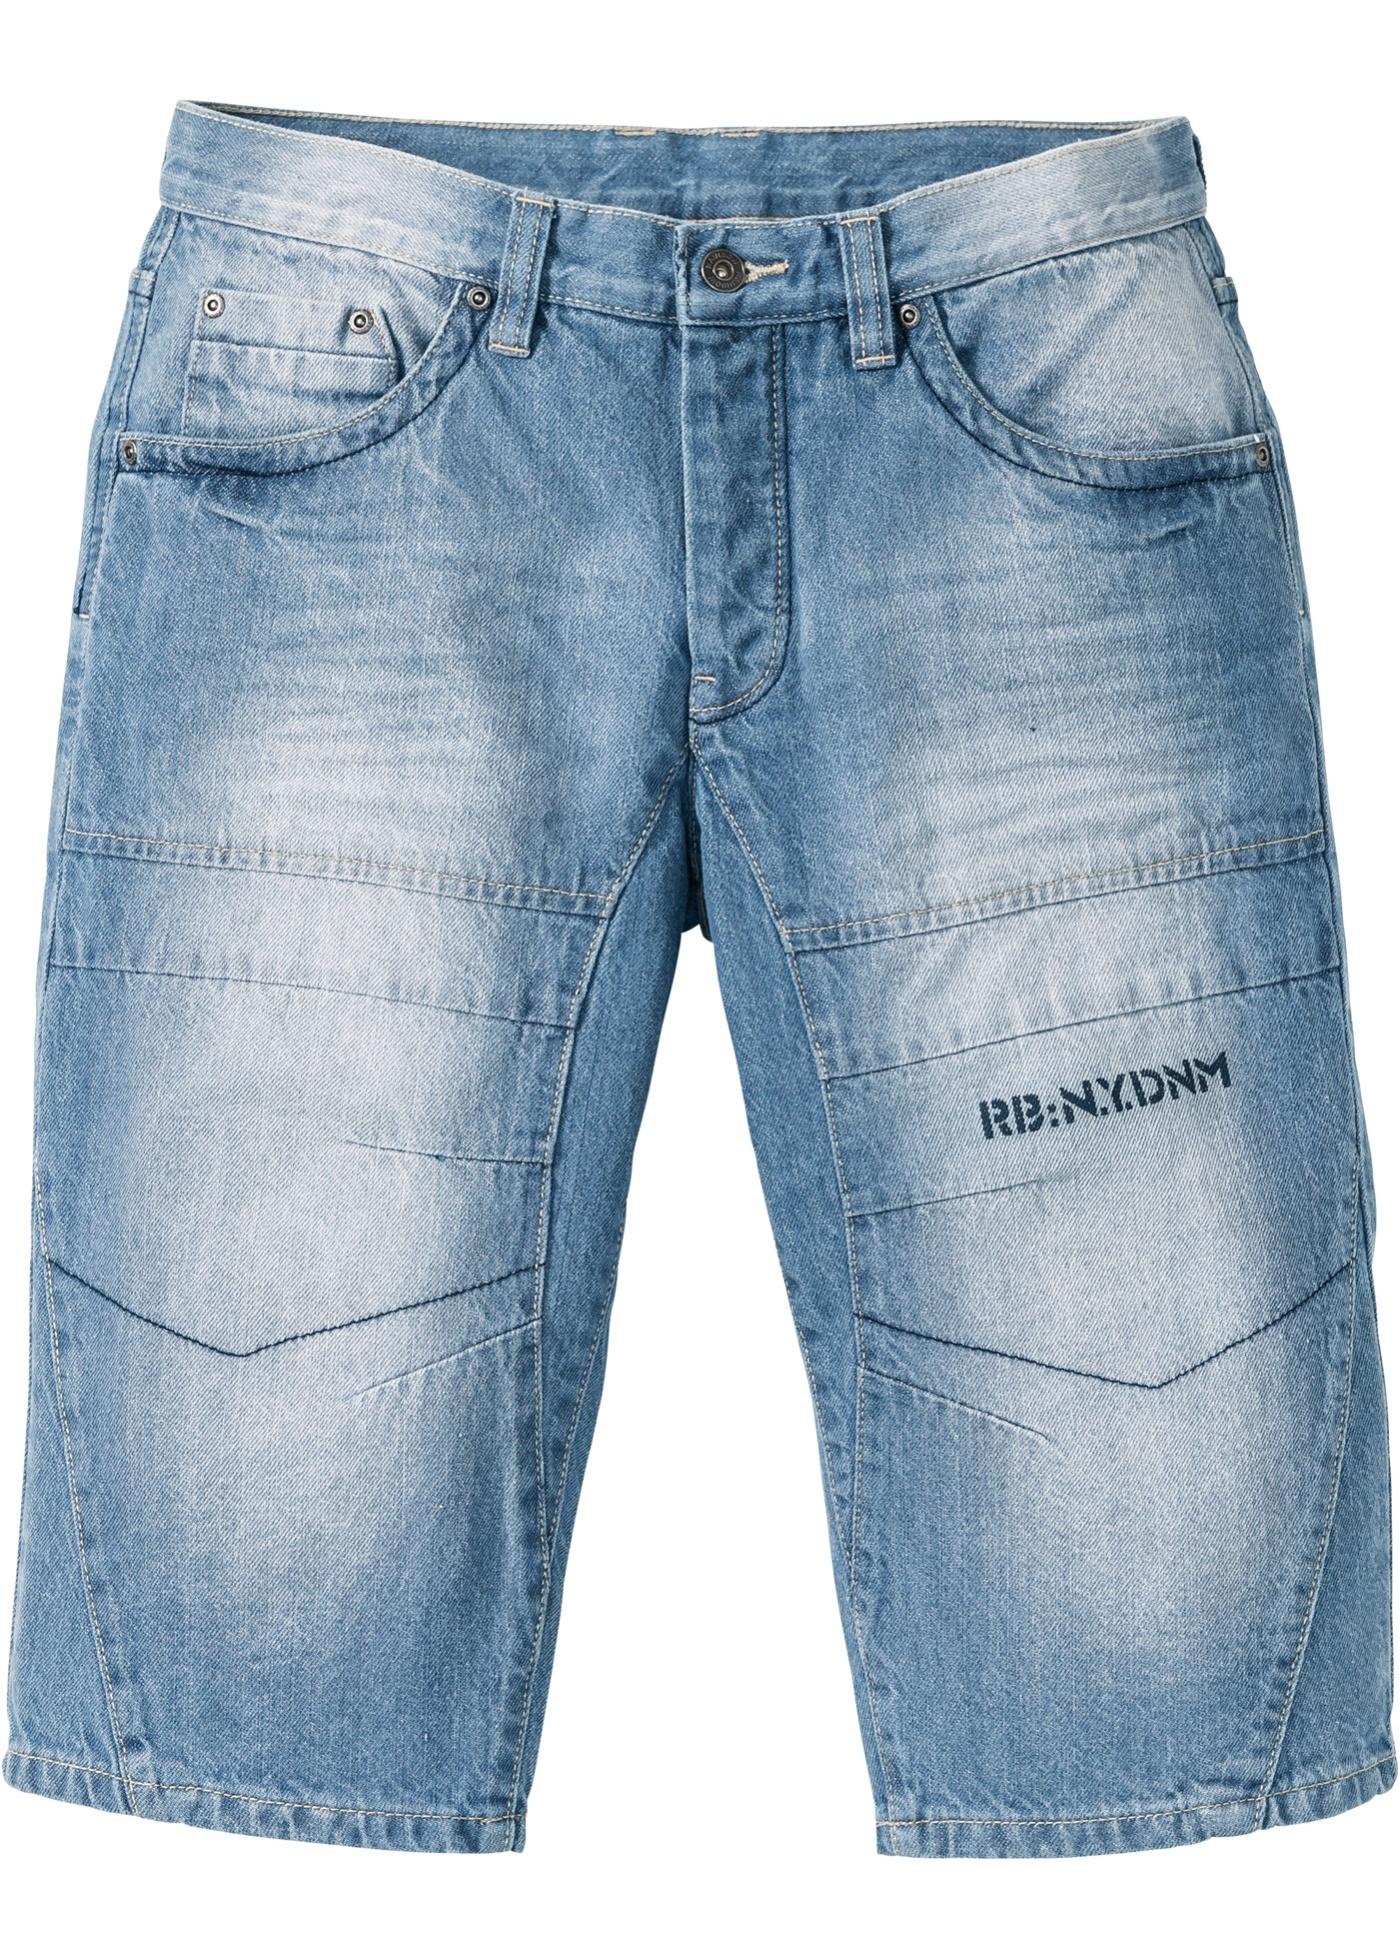 Bonprix SE - Långa jeansbermudas, normal passform 349.00